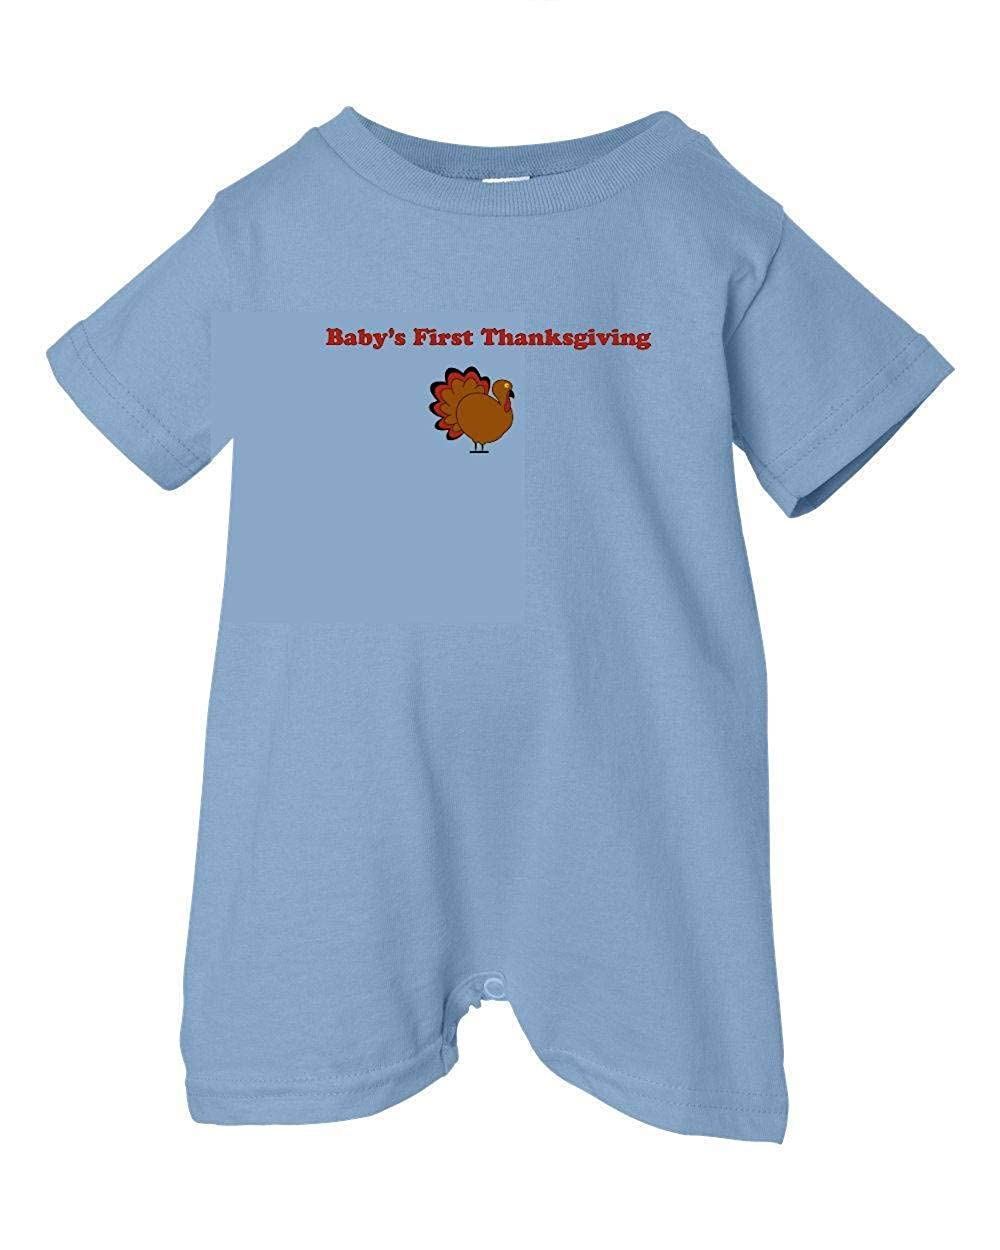 Gobble Lt. Blue, 6 Months T-Shirt Romper Festive Threads Unisex Baby Babys First Thanksgiving